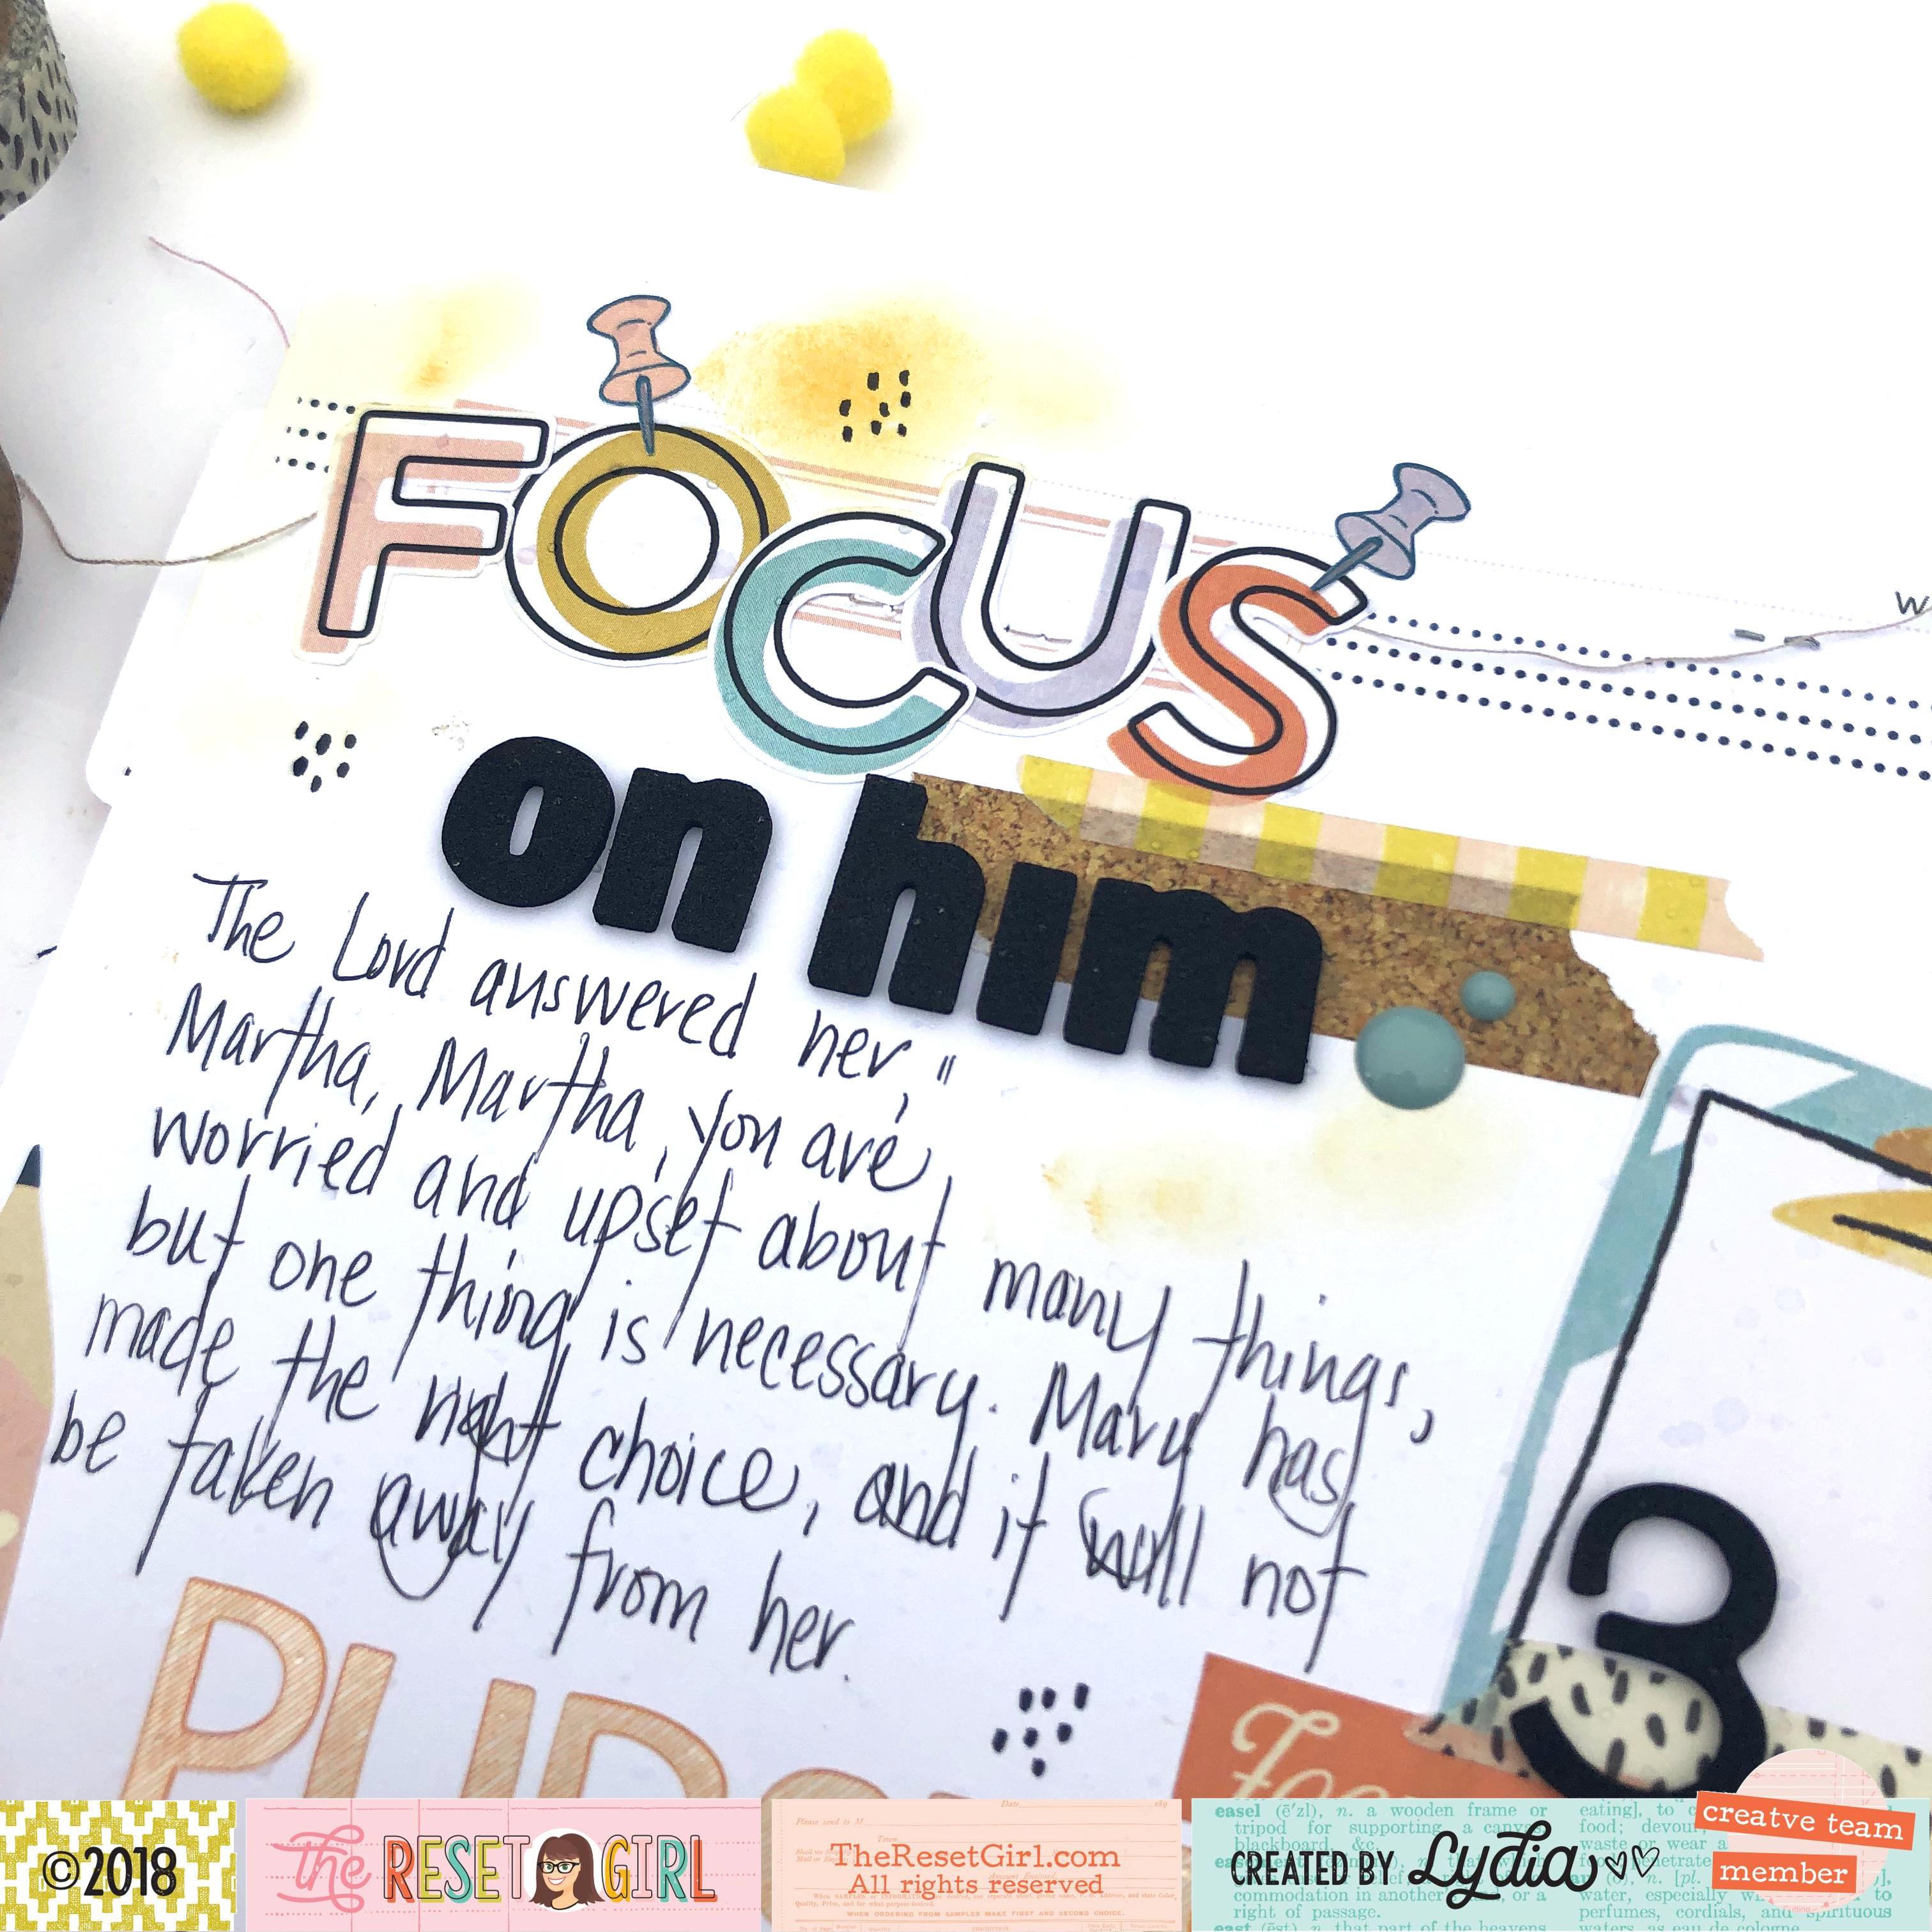 lydia_flcfocused_playbook_6